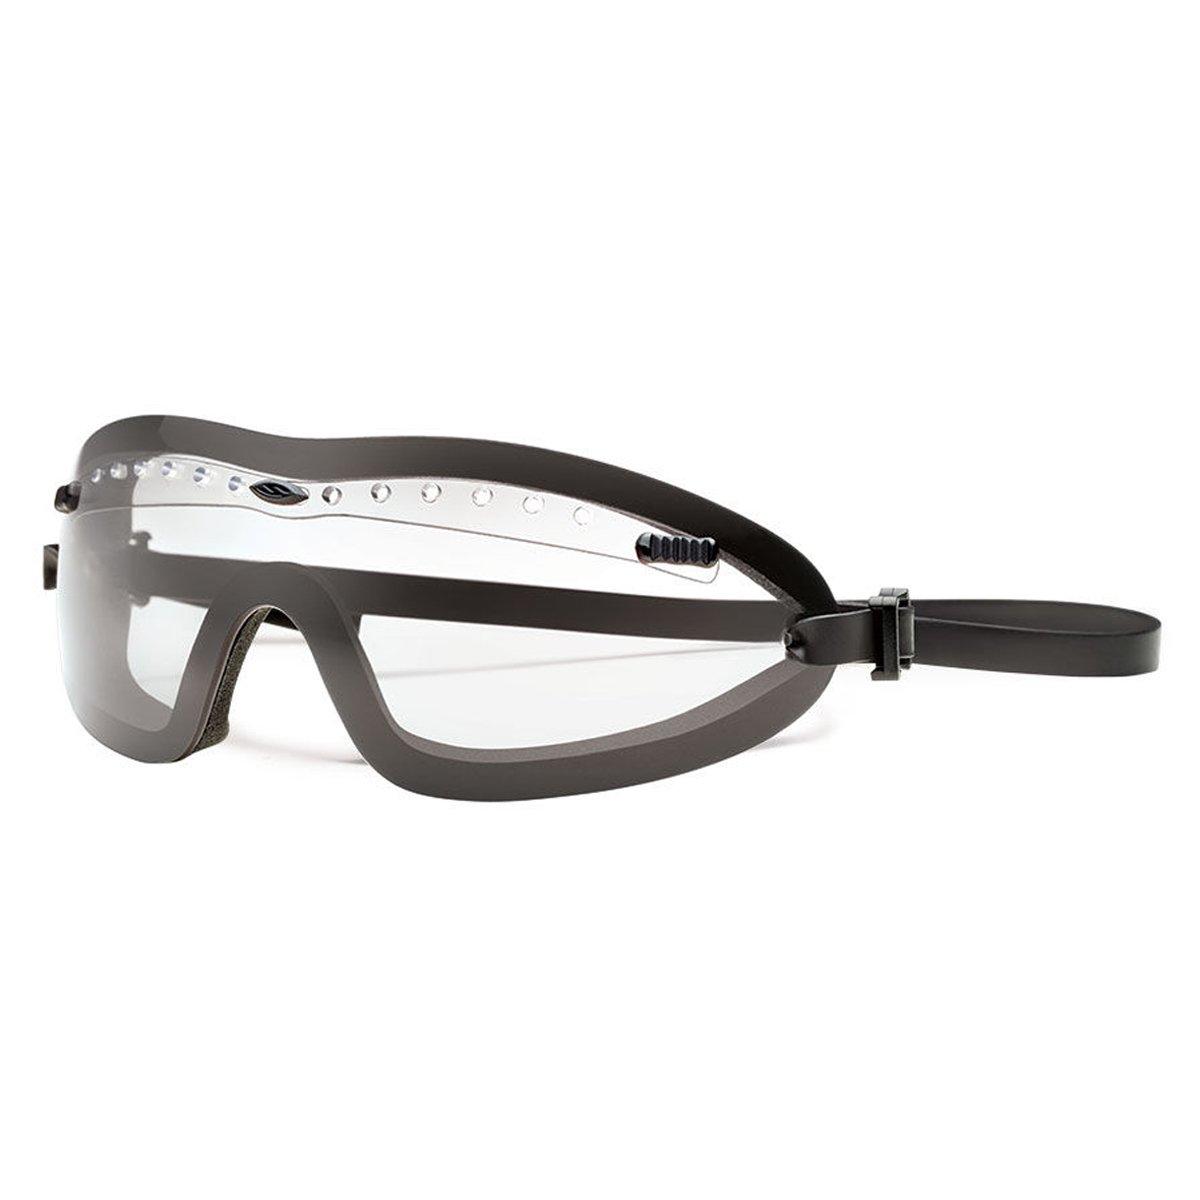 Smith Optics Elite Boogie Regulator Goggle Clear Lens by Smith Optics Elite